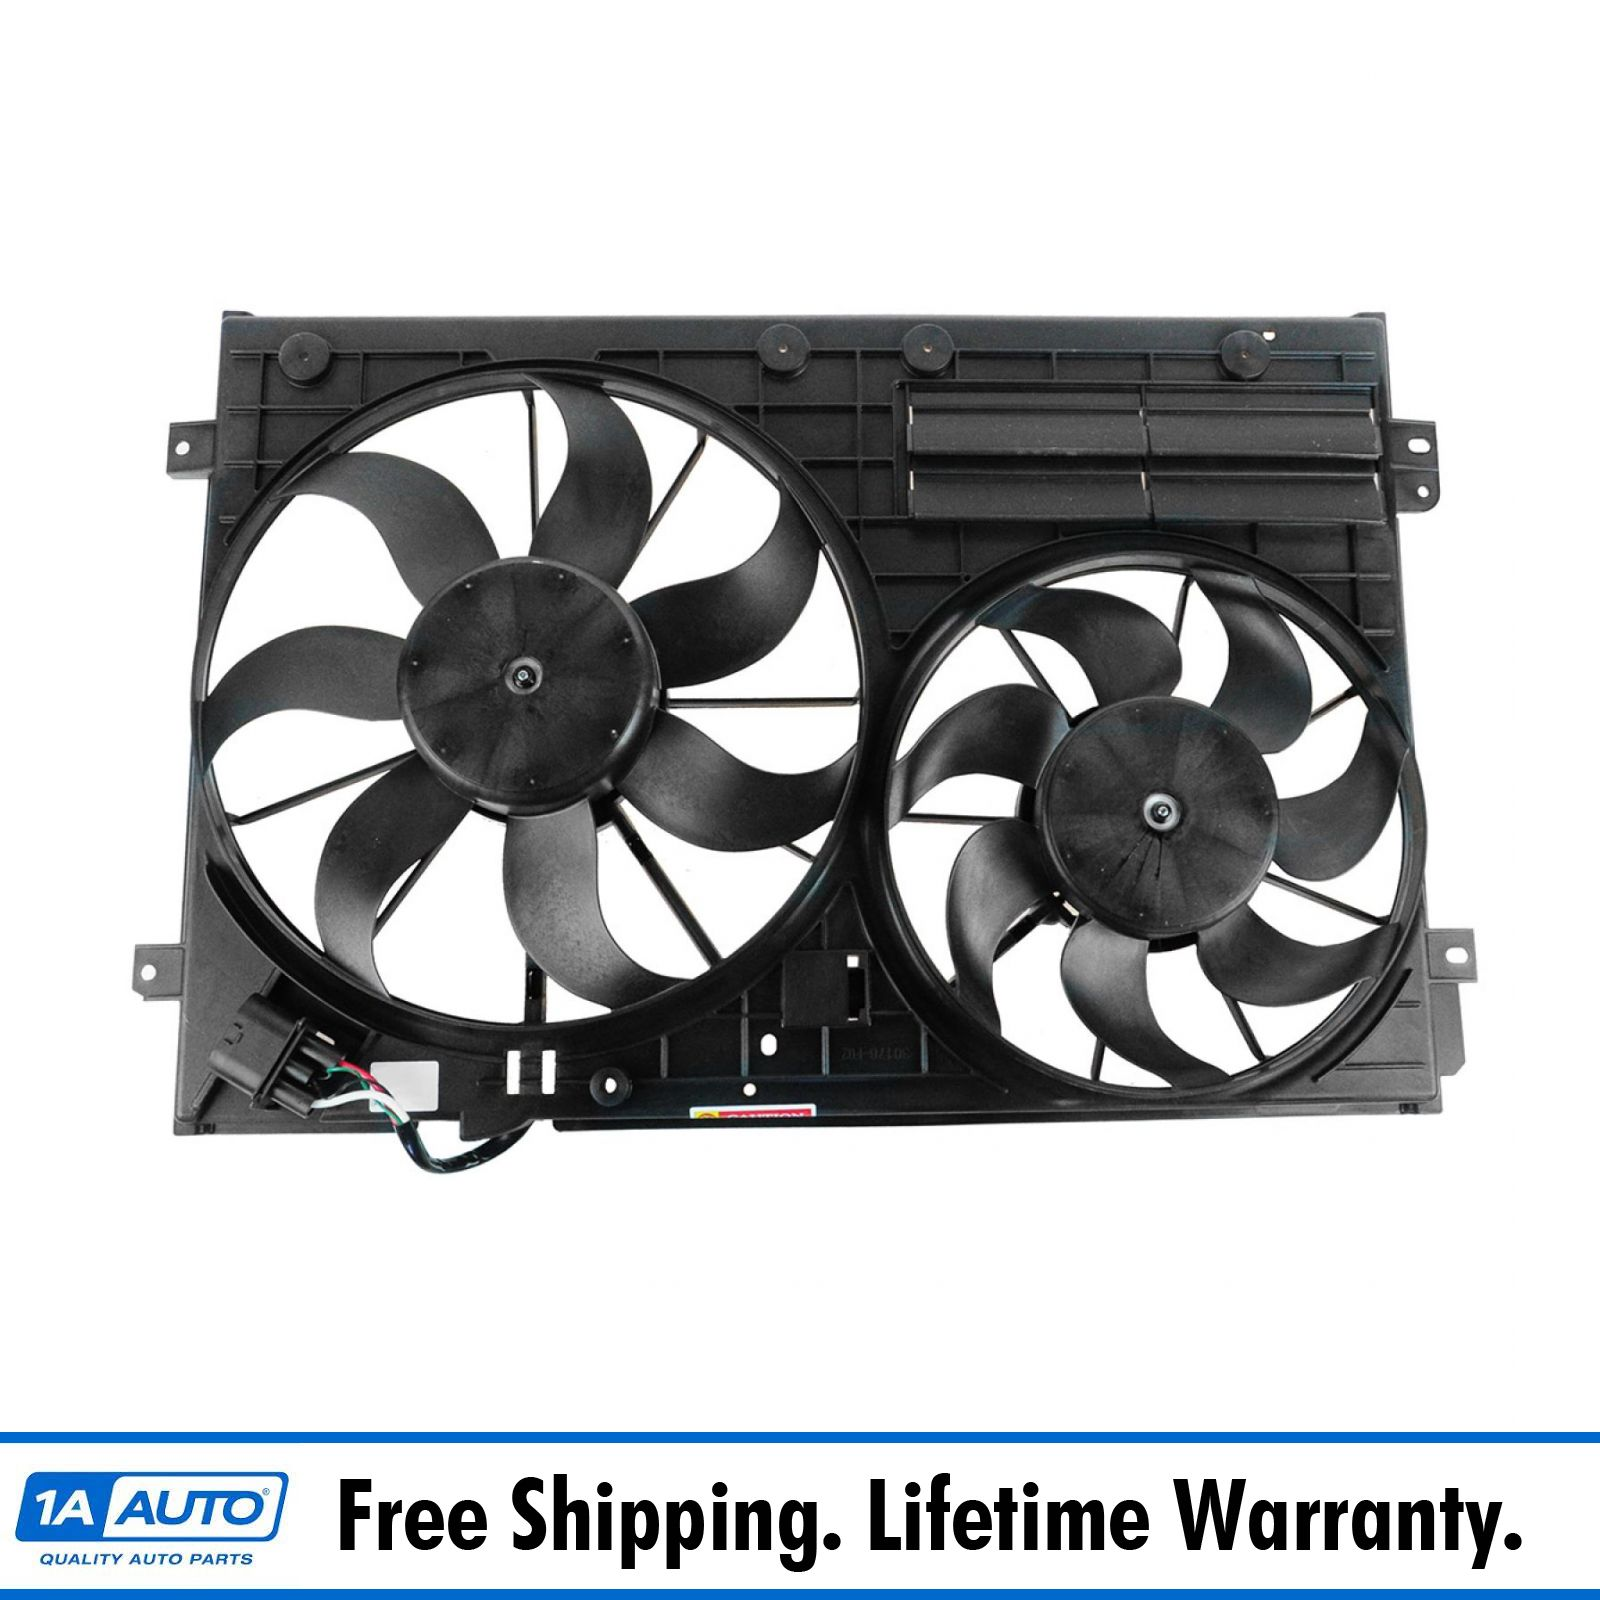 Radiator Cooling Dual Fan Assembly for Audi A3 TT  Quattro VW